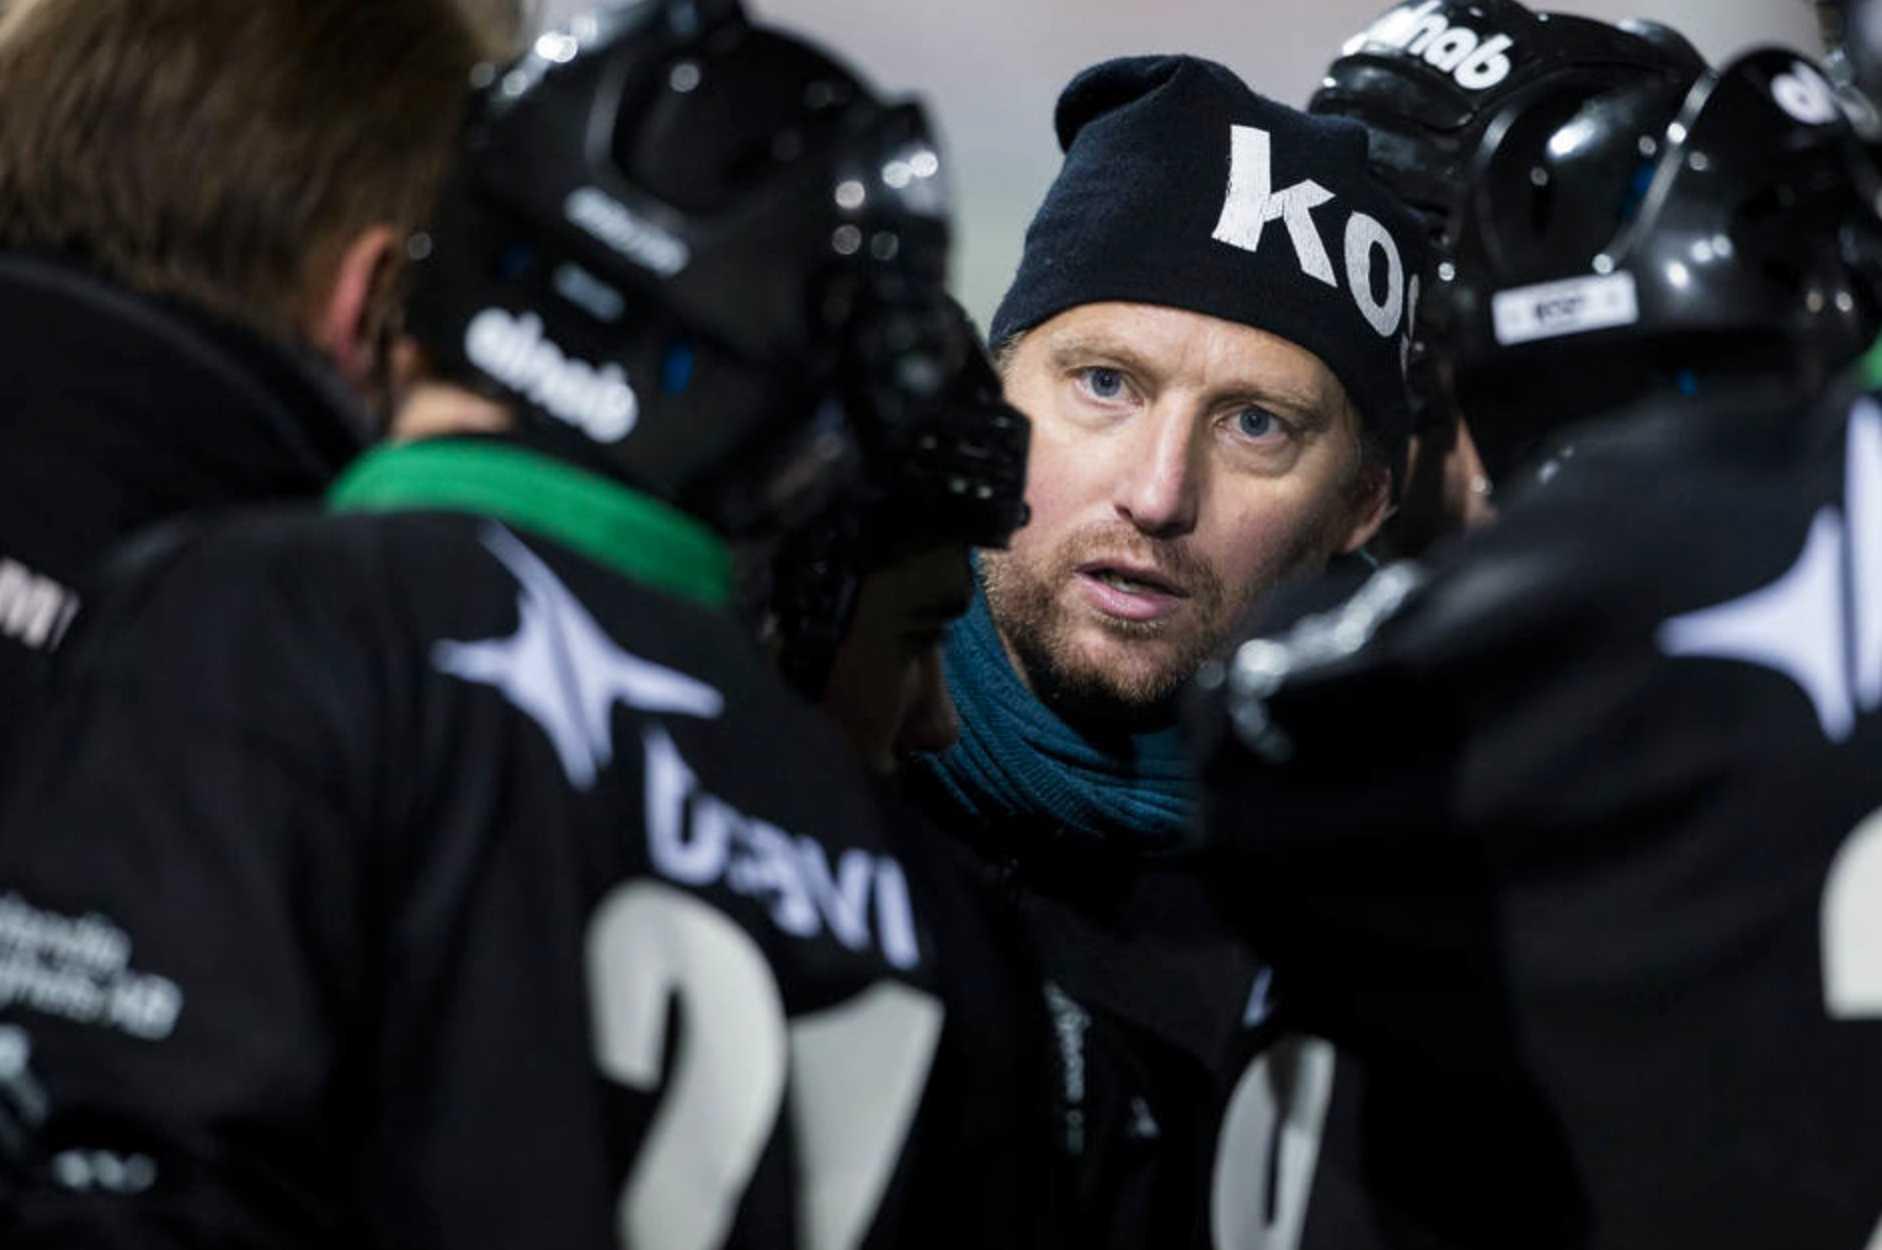 GAIS tränare Jonas Holgersson under Time Out under bandymatchen i Elitserien mellan GAIS - Vetlanda den 26 november 2013 i Göteborg.